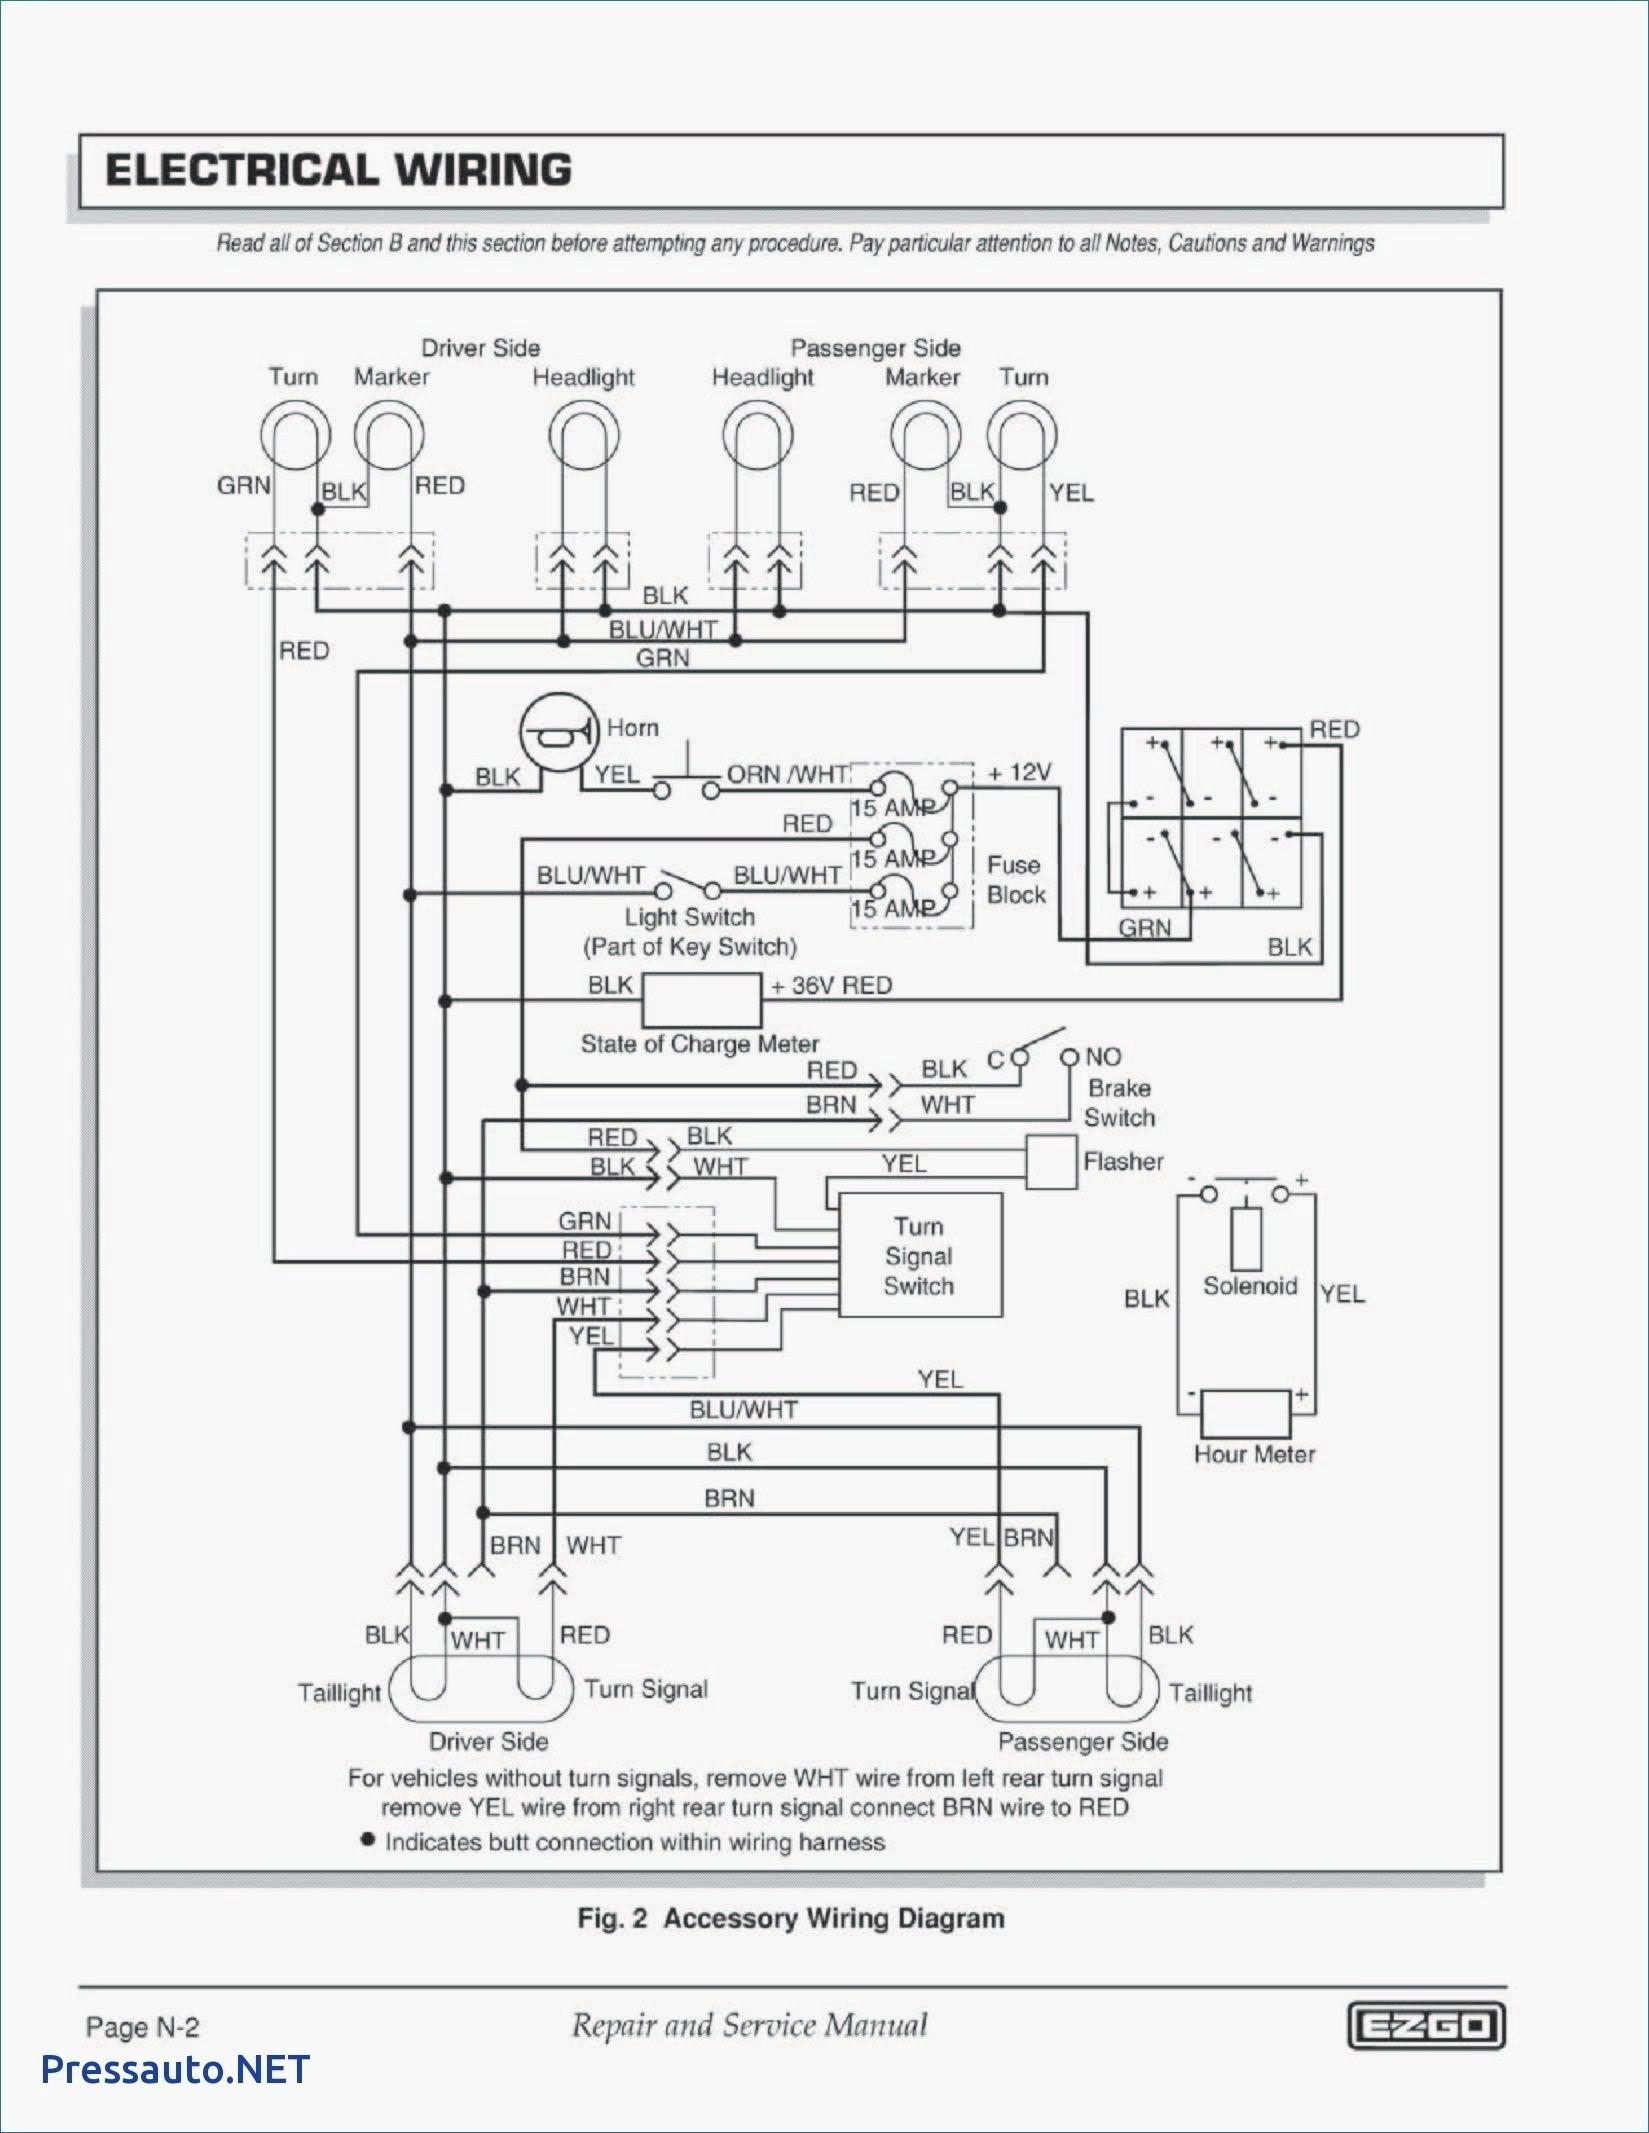 ez go electric golf cart wiring diagram best of ezgo wiring diagram unique ezgo wiring diagram luxury ez go gas golf of ez go electric golf cart wiring diagram